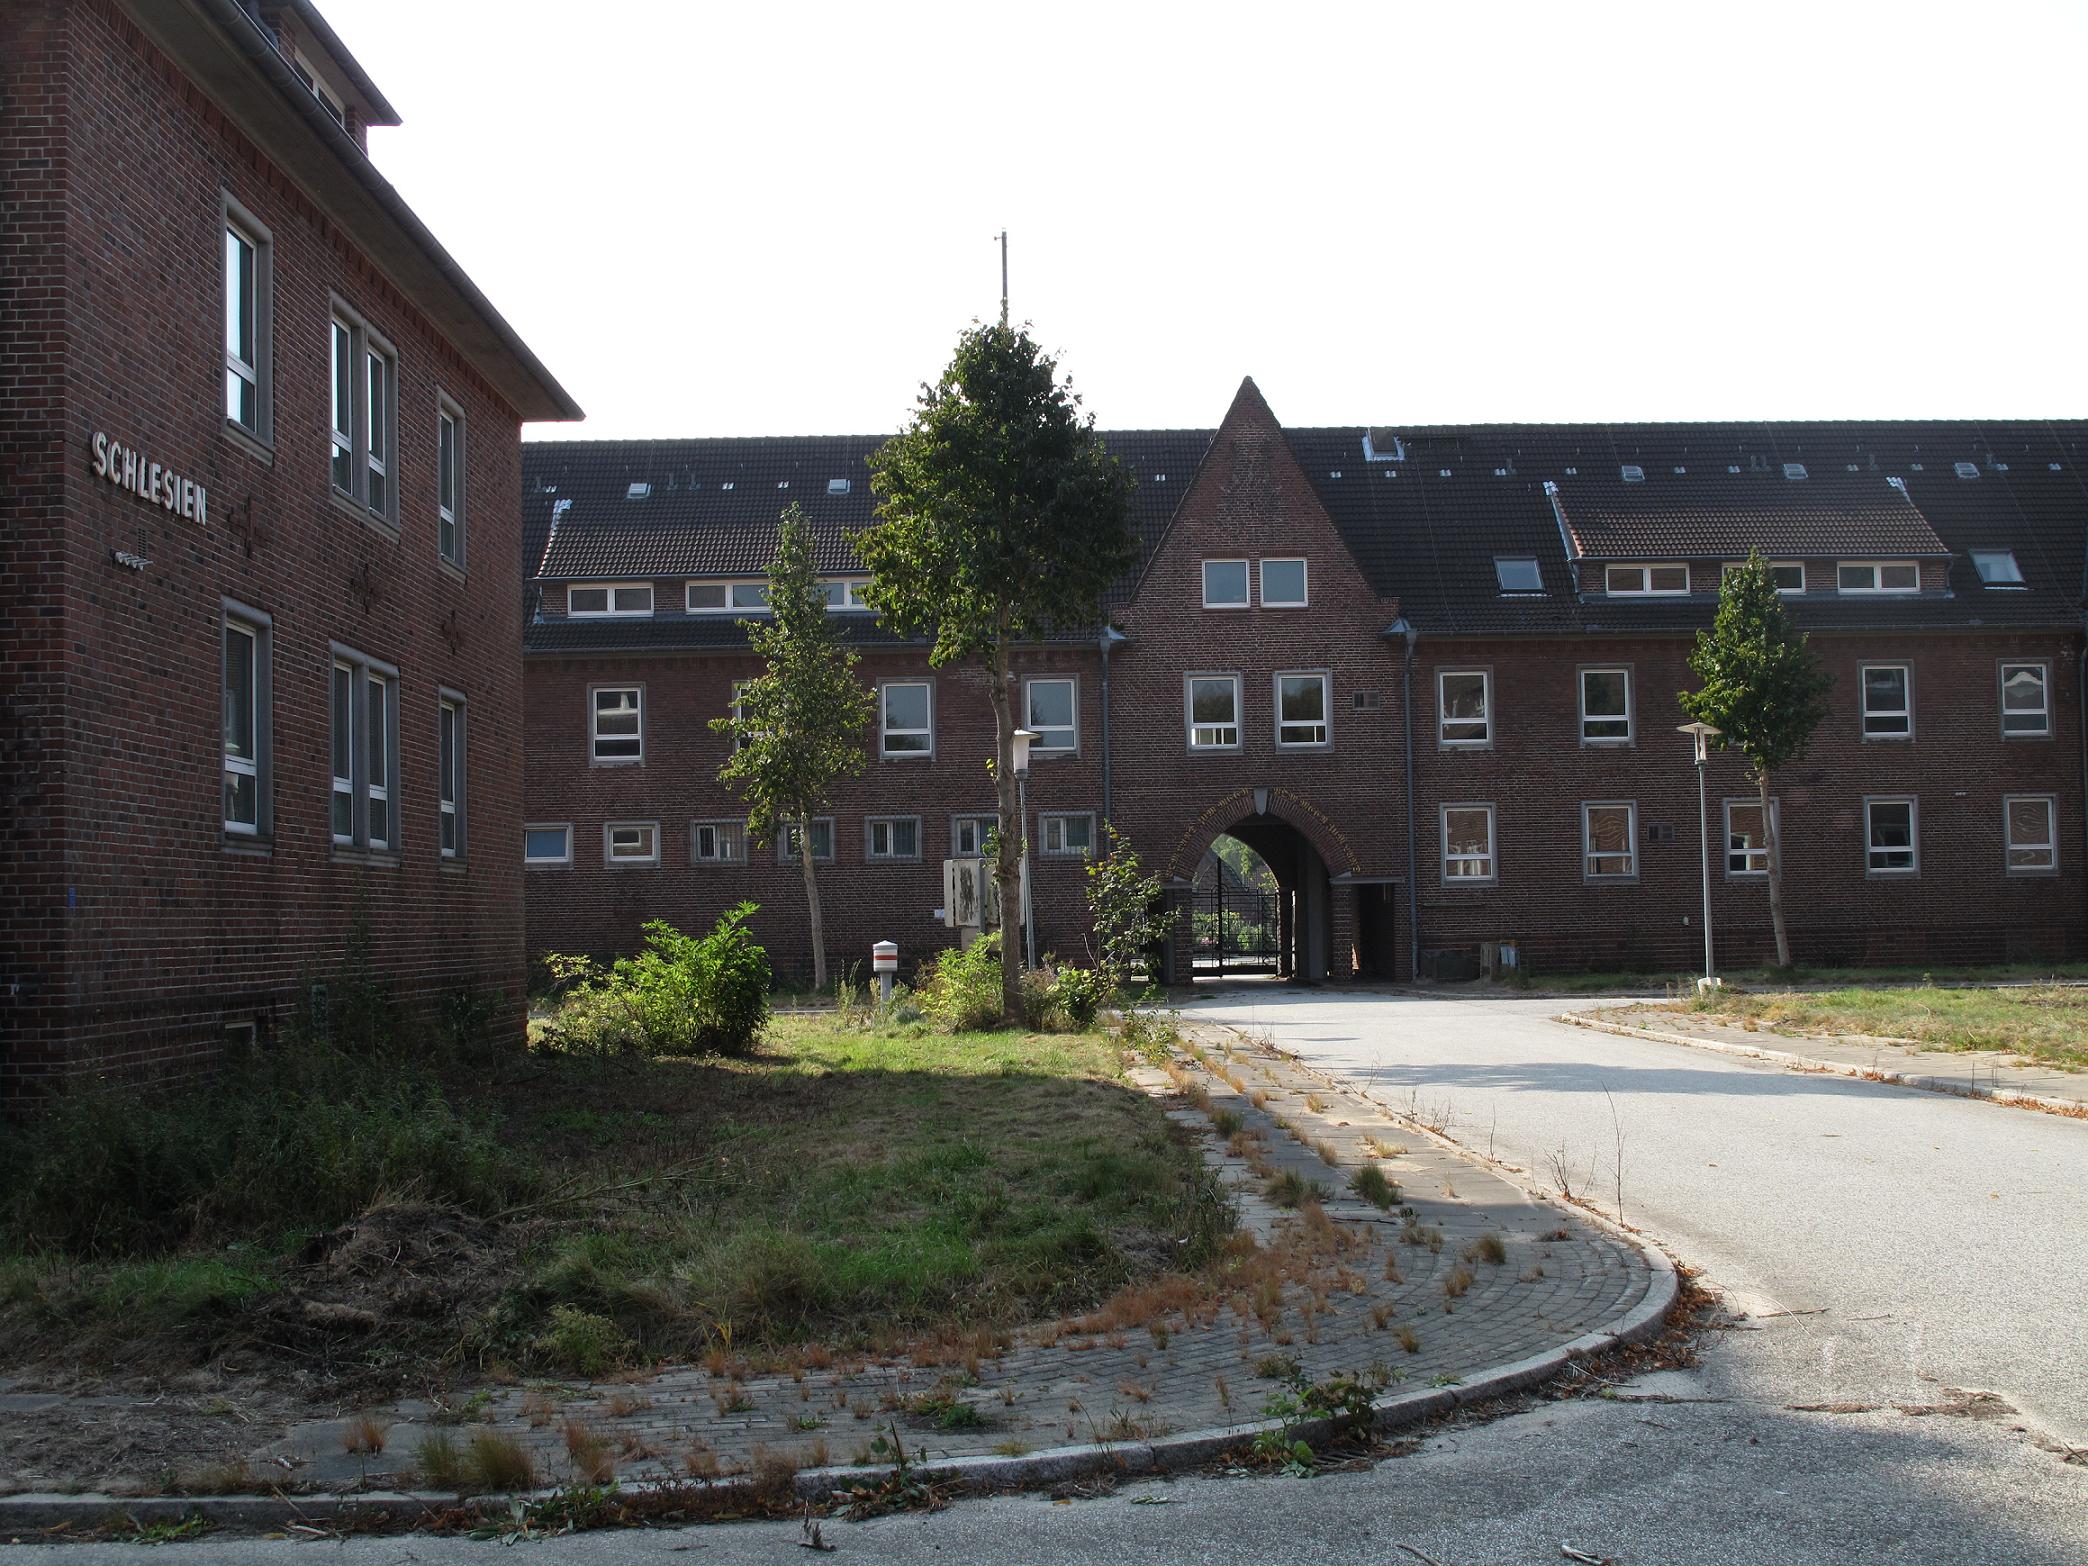 Glückstadt 2009-4